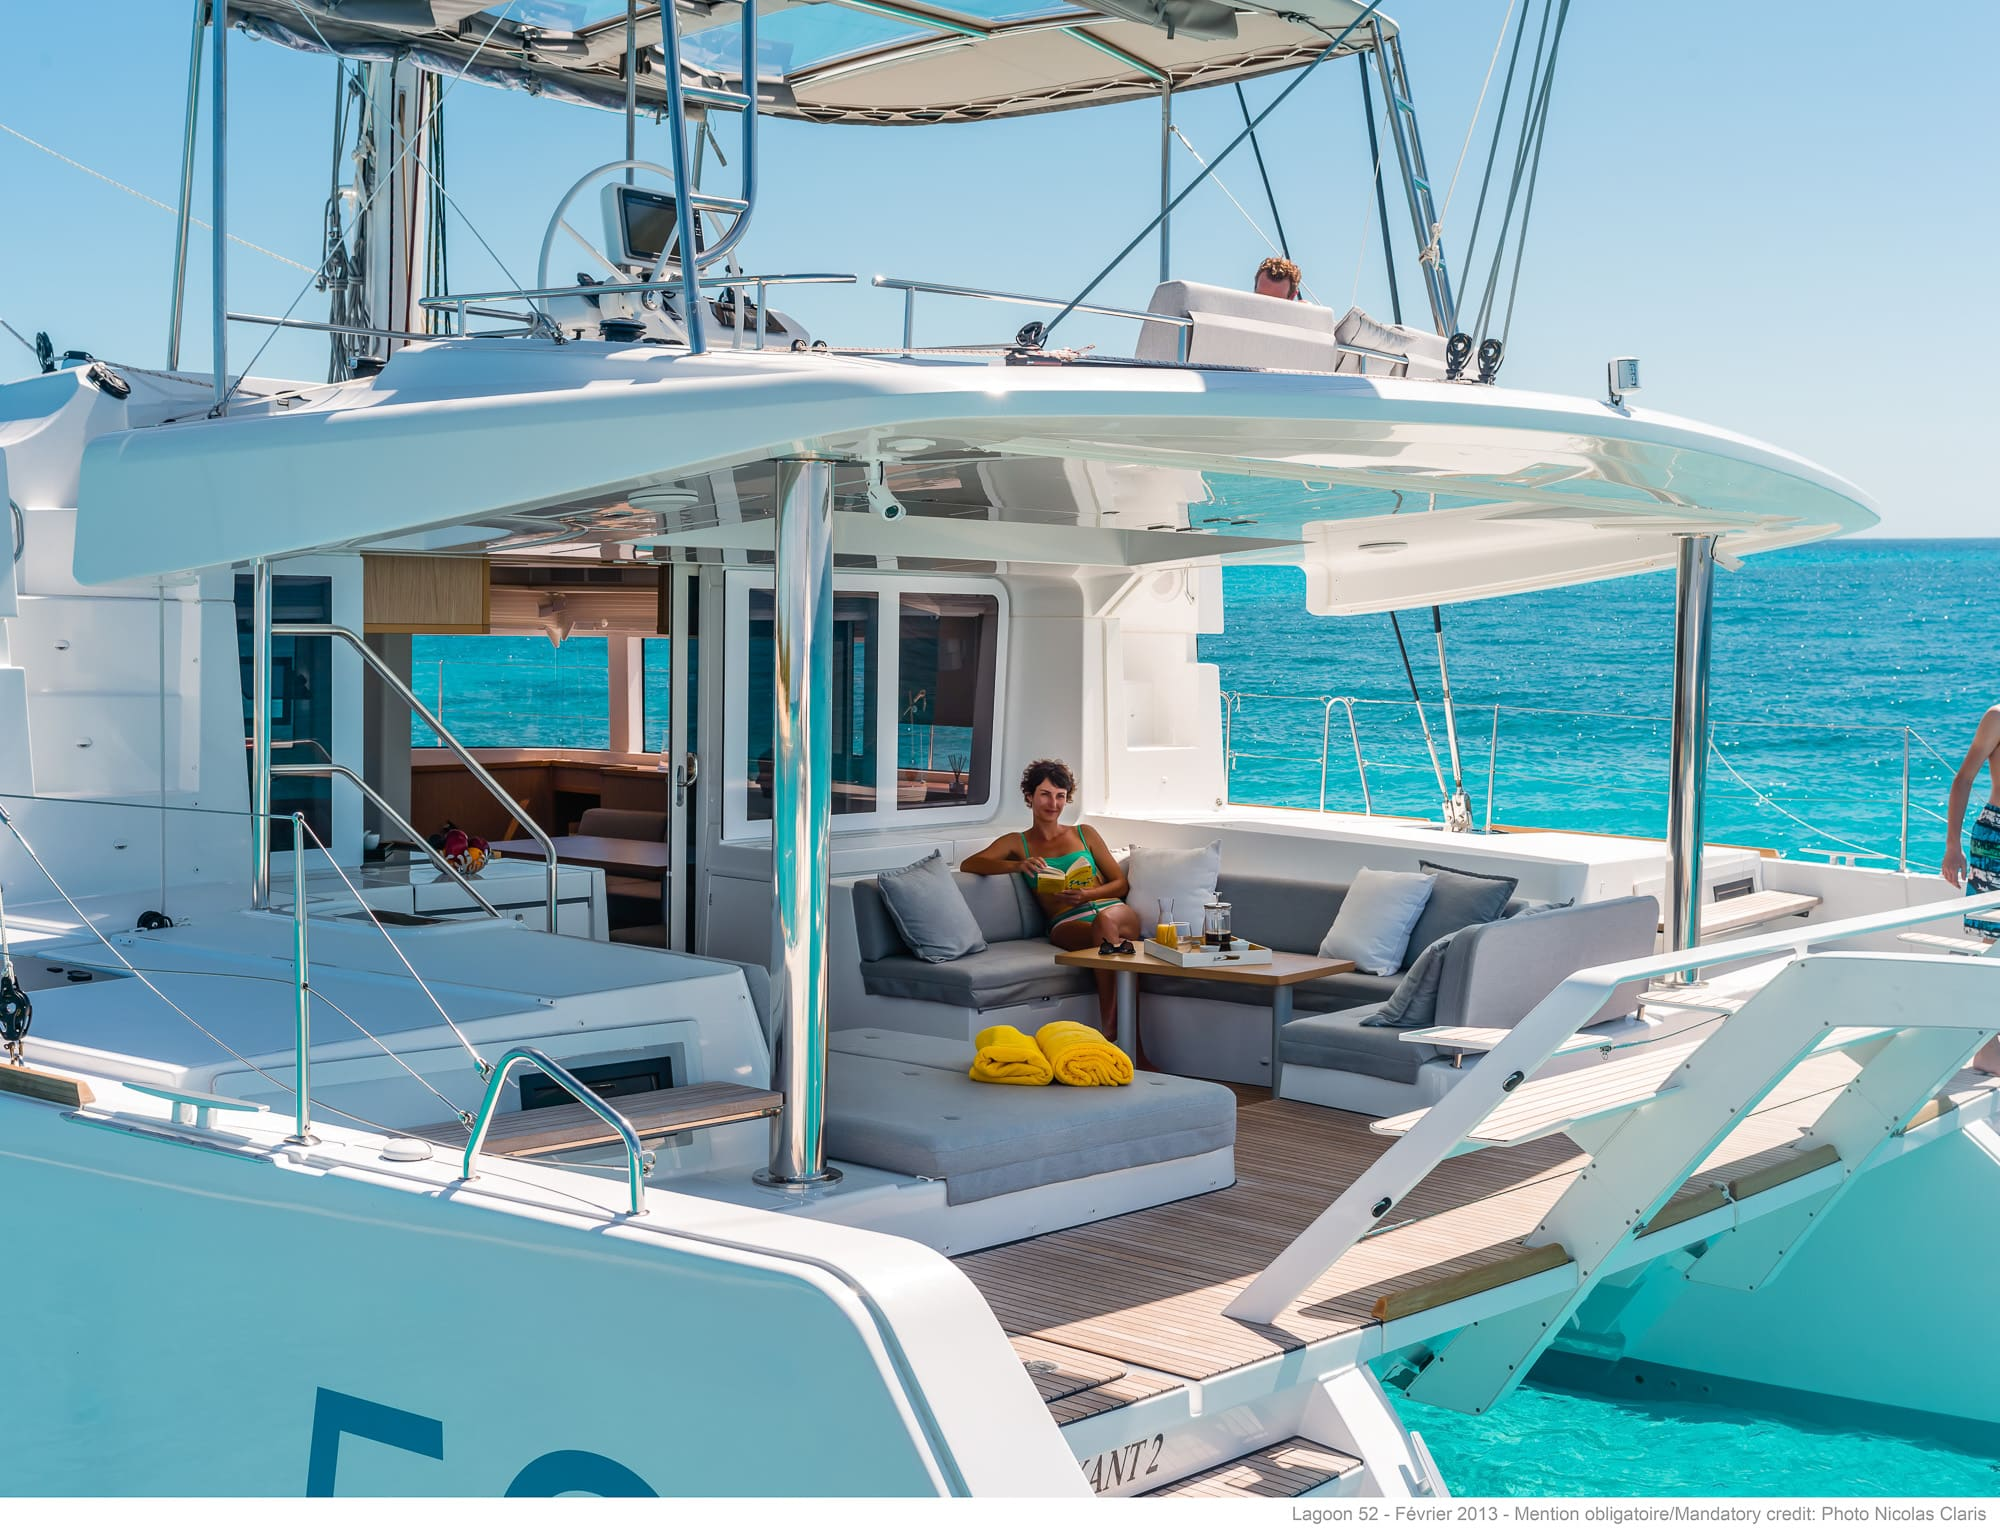 lagoon 52 f-yacht-charter-croatia-sailing-holidays-croatia-booking-yacht-charter-croatia-catamarans-sailboats-motorboats-gulets-luxury-yachts-boat-rental-croatia 26